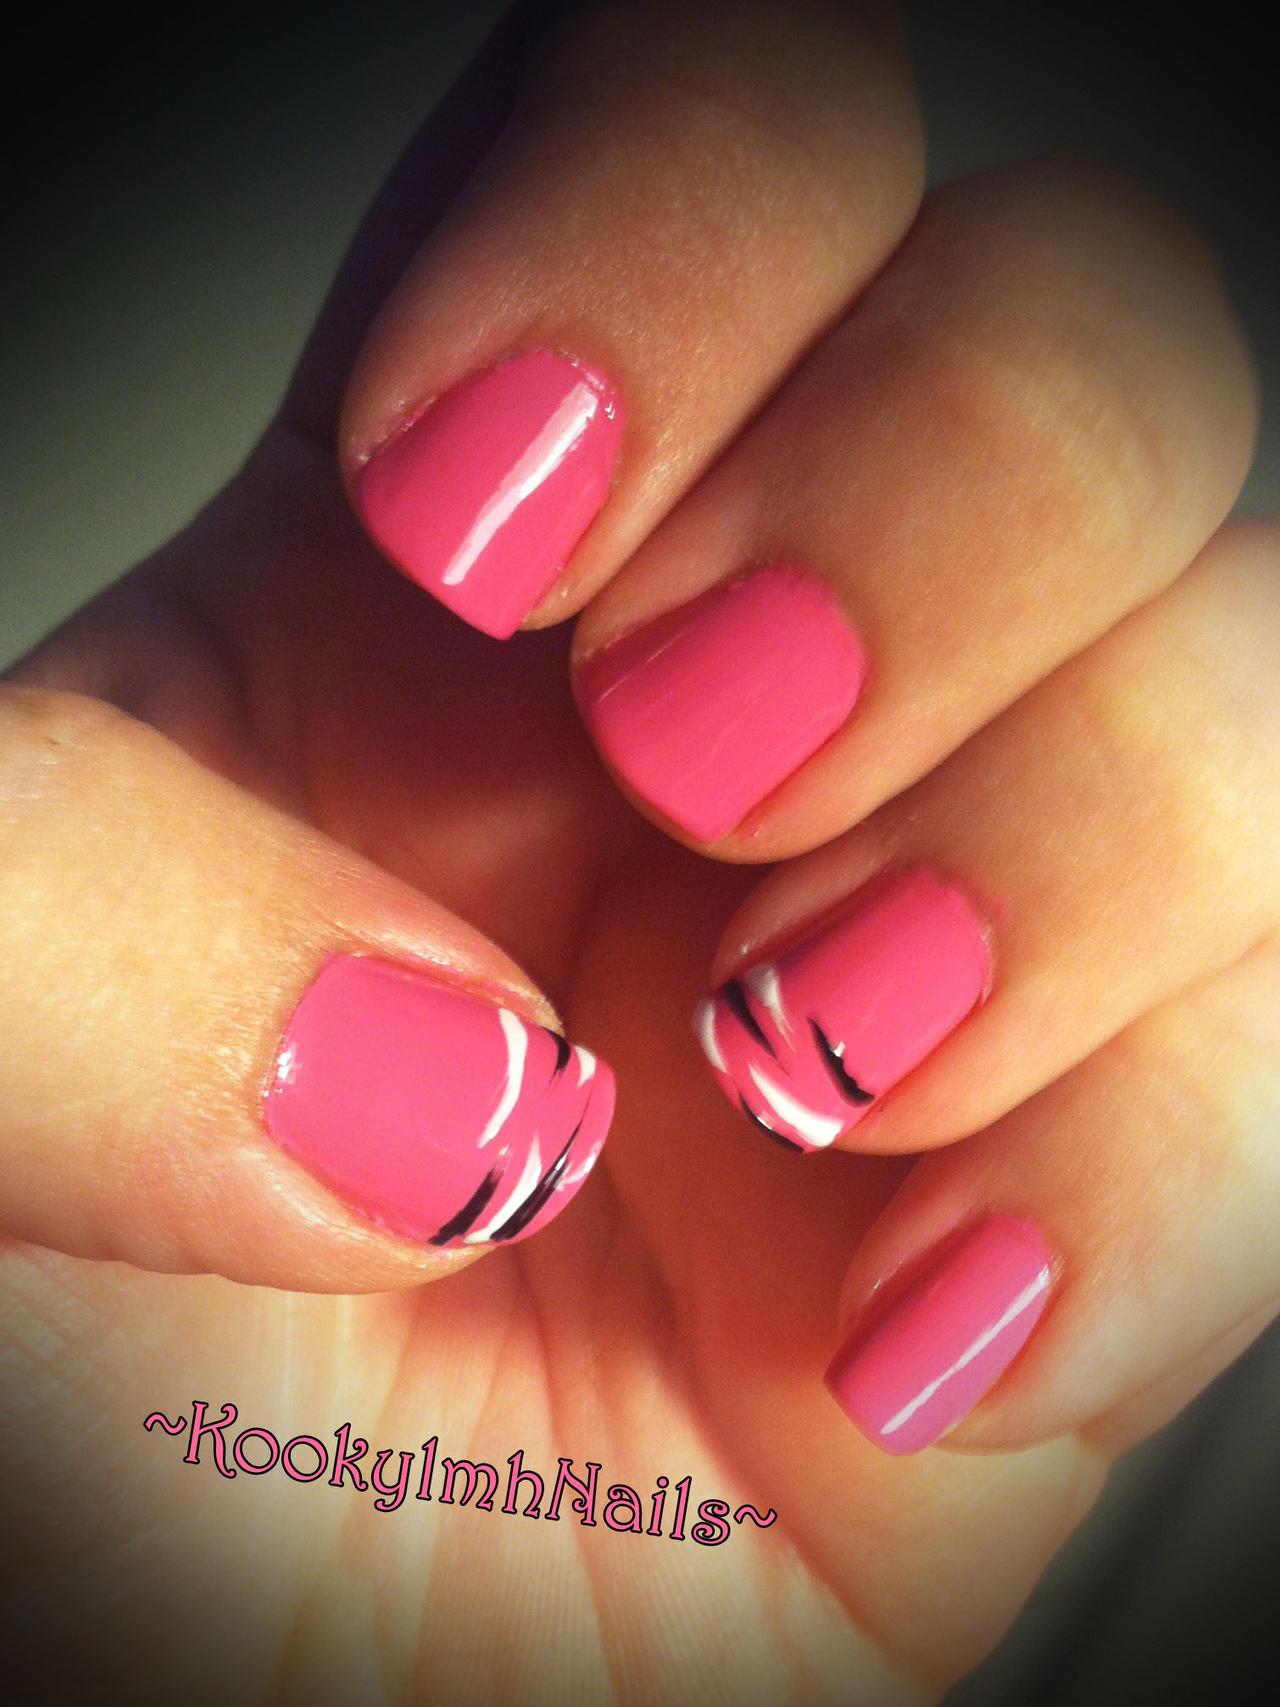 Pink Zebra French Tips by KookylmhNails on DeviantArt